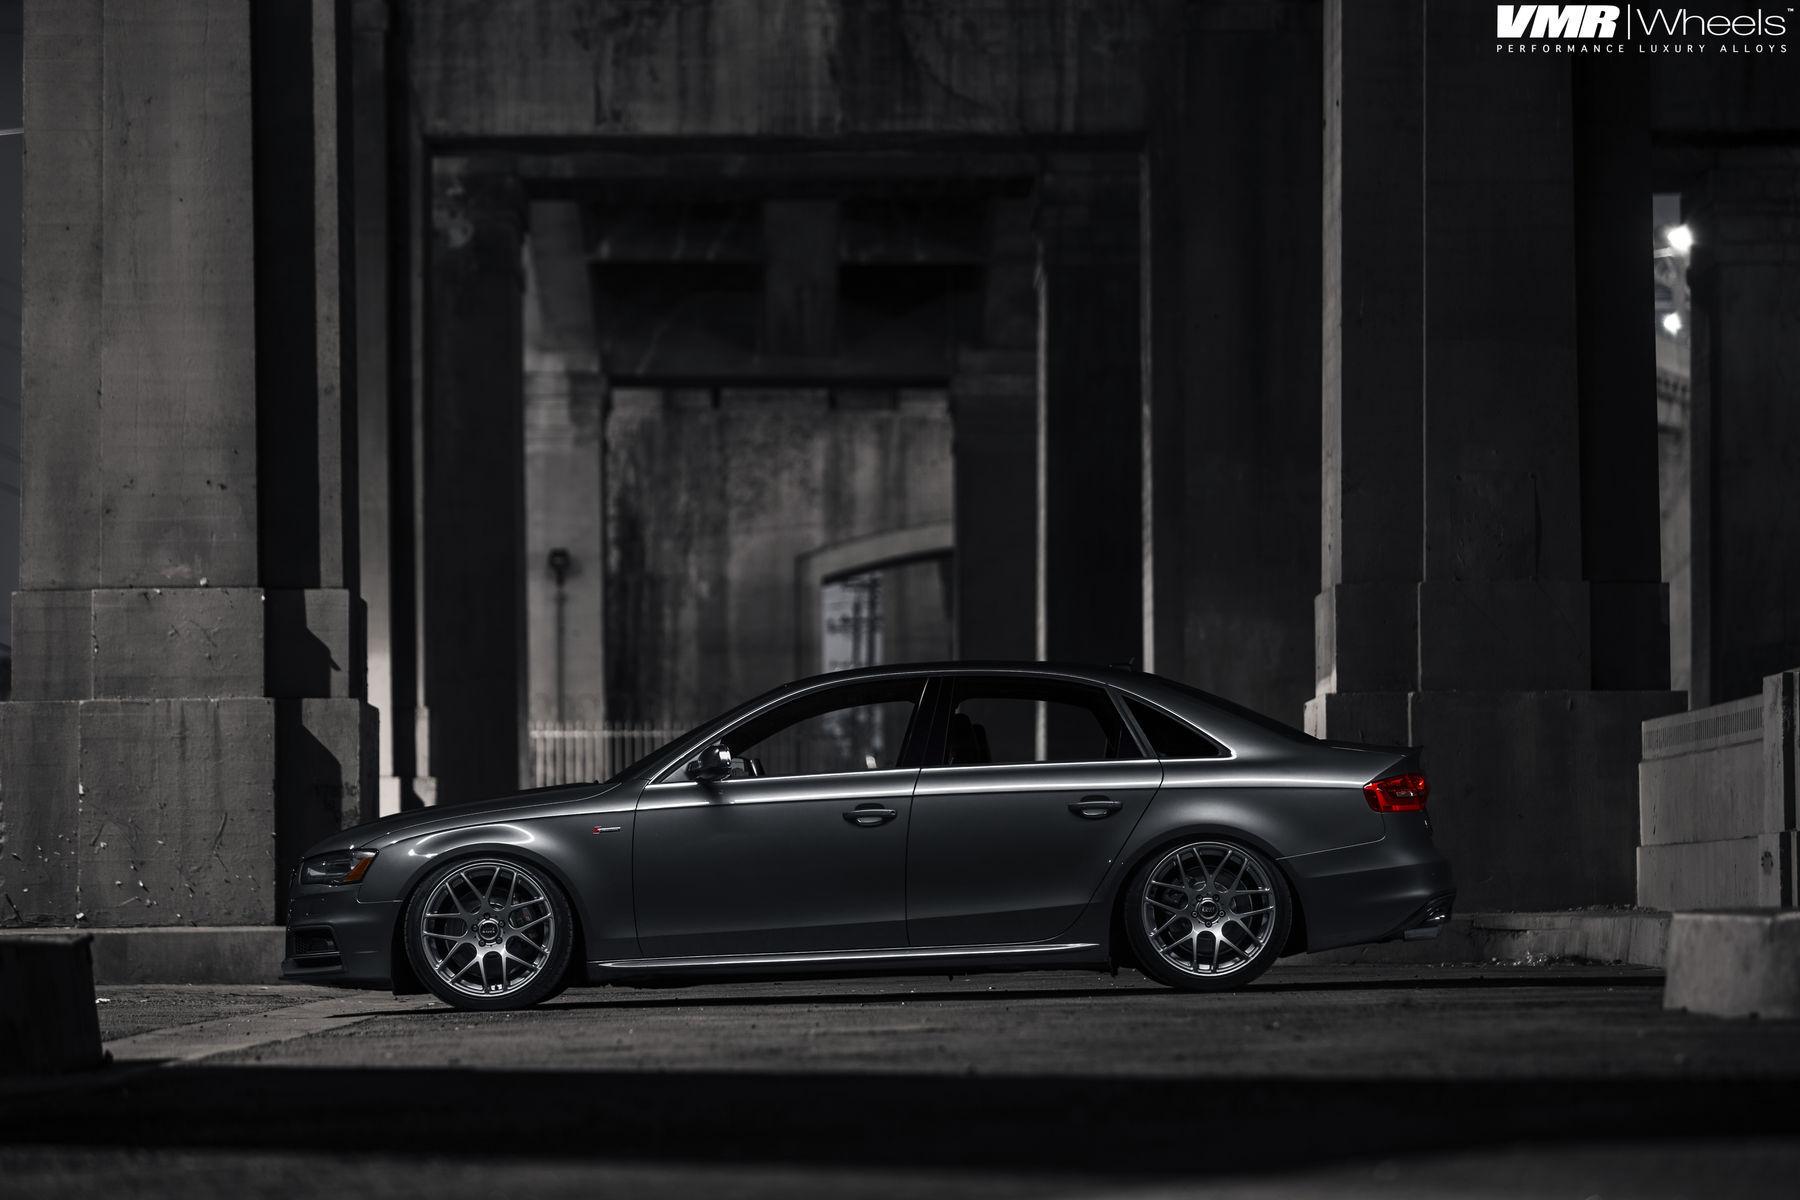 2014 Audi S4 | Audi B8.5 S4 Monsoon Grey | V710 Gunmetal 19